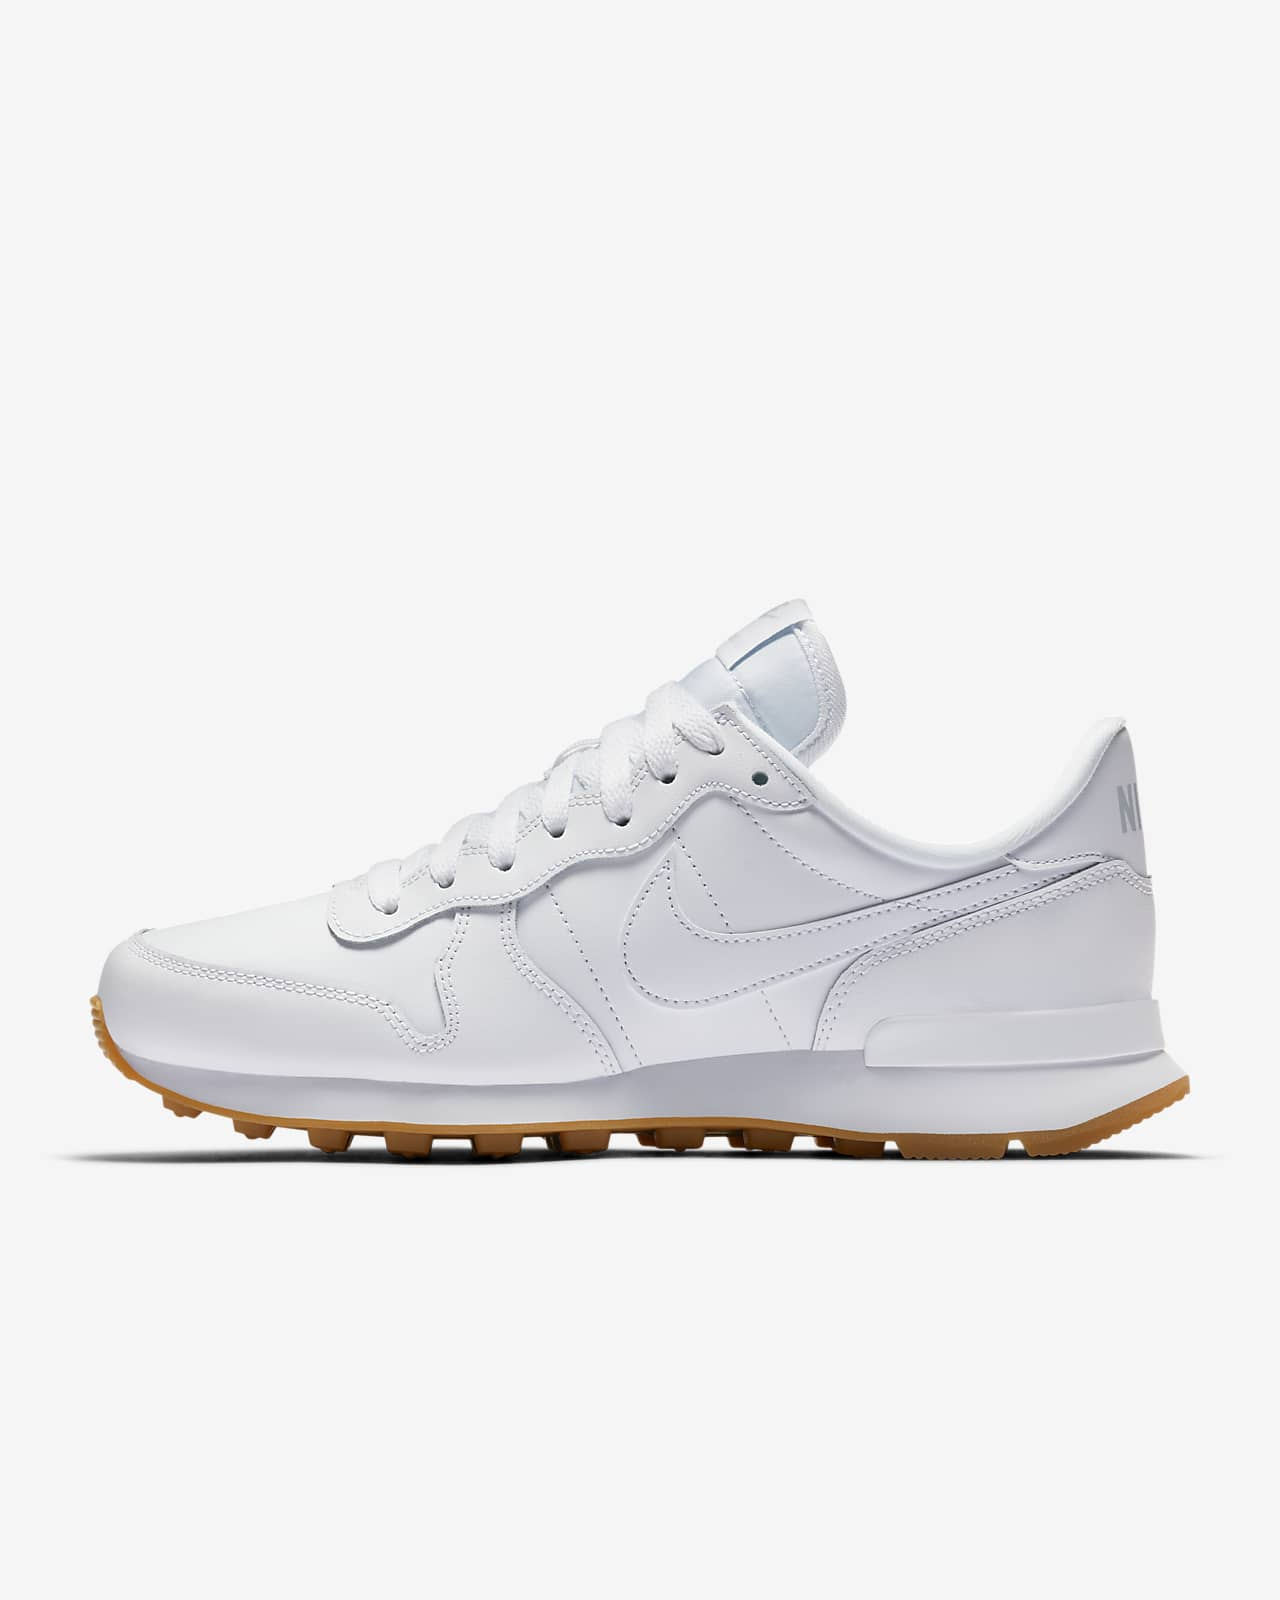 Nike Internationalist Women's Shoes. Nike AT